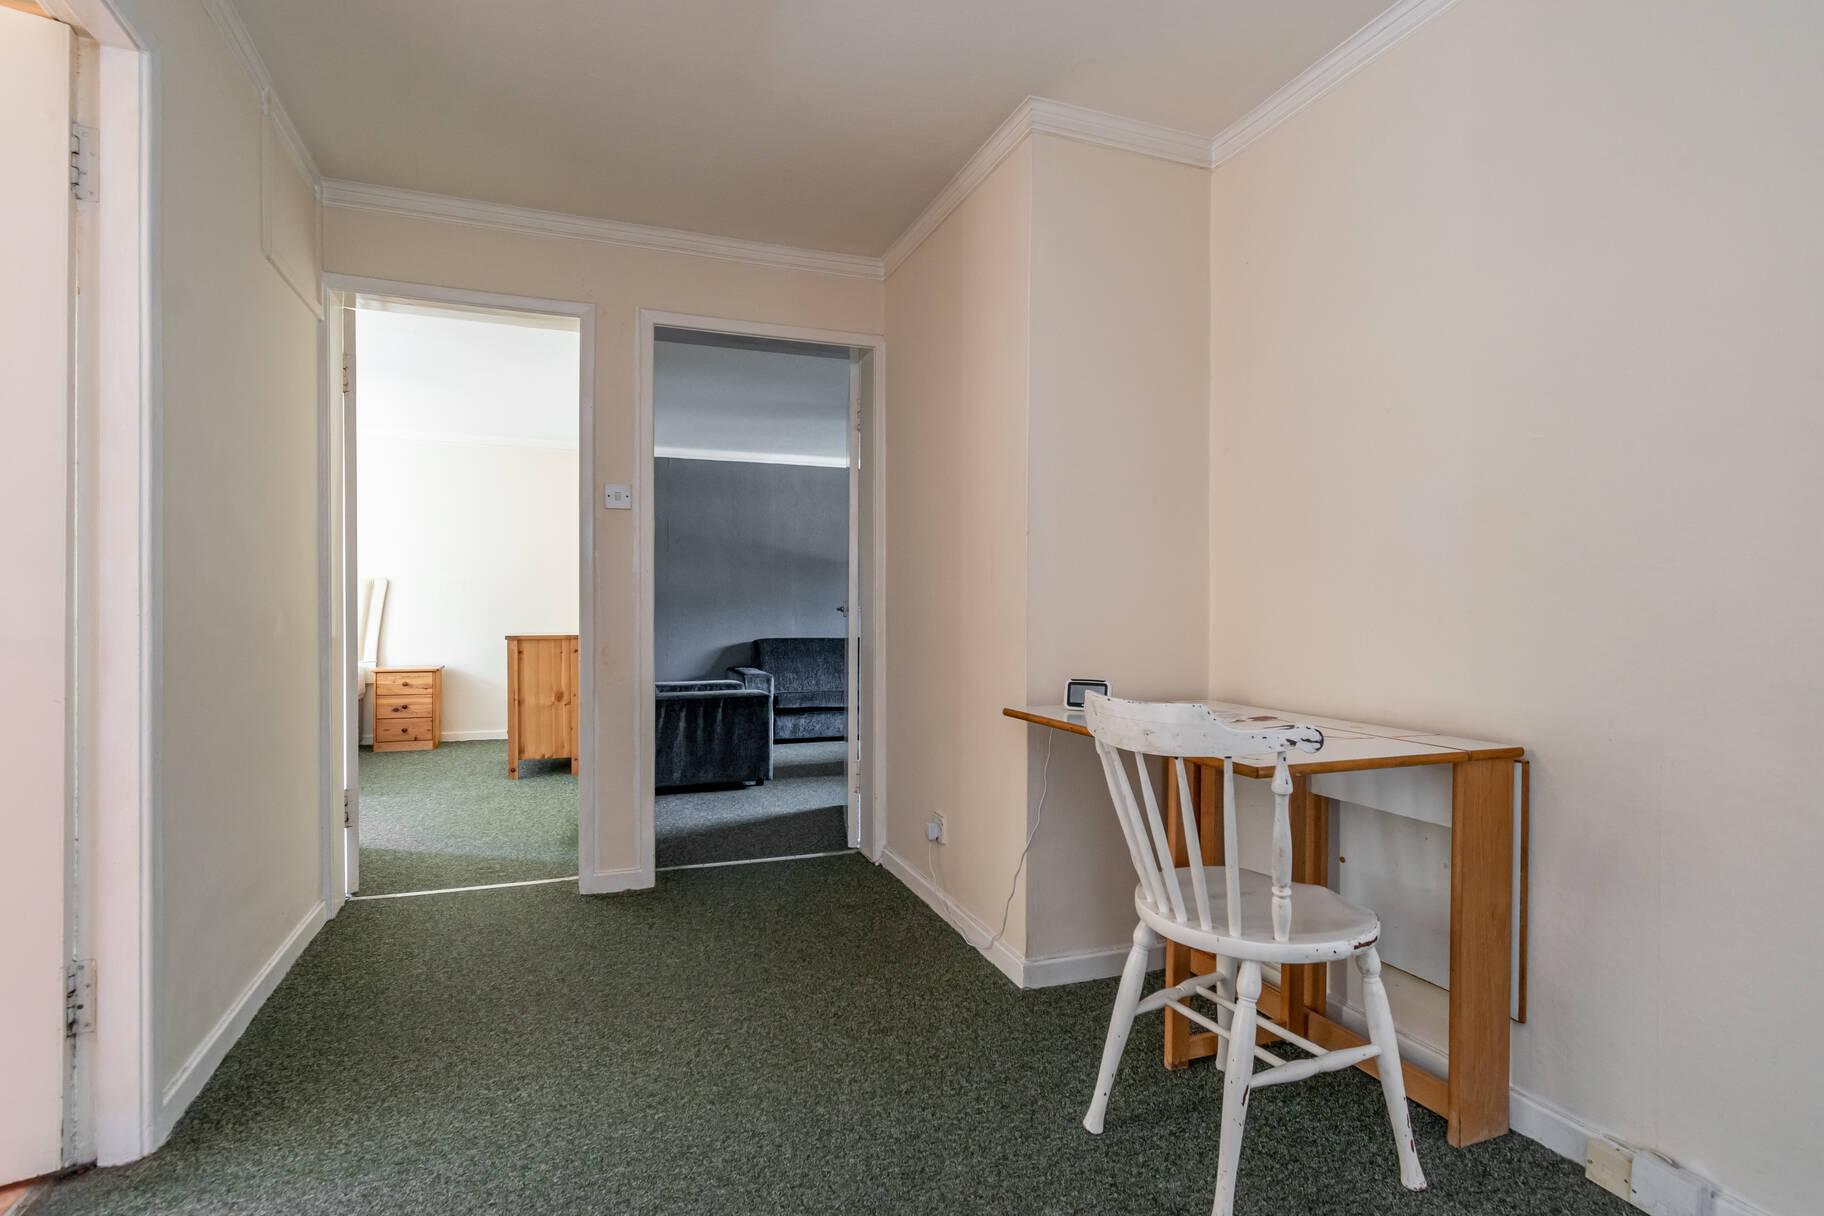 2/2 Maidencraig Court, Blackhall, Edinburgh, EH4 2BQ